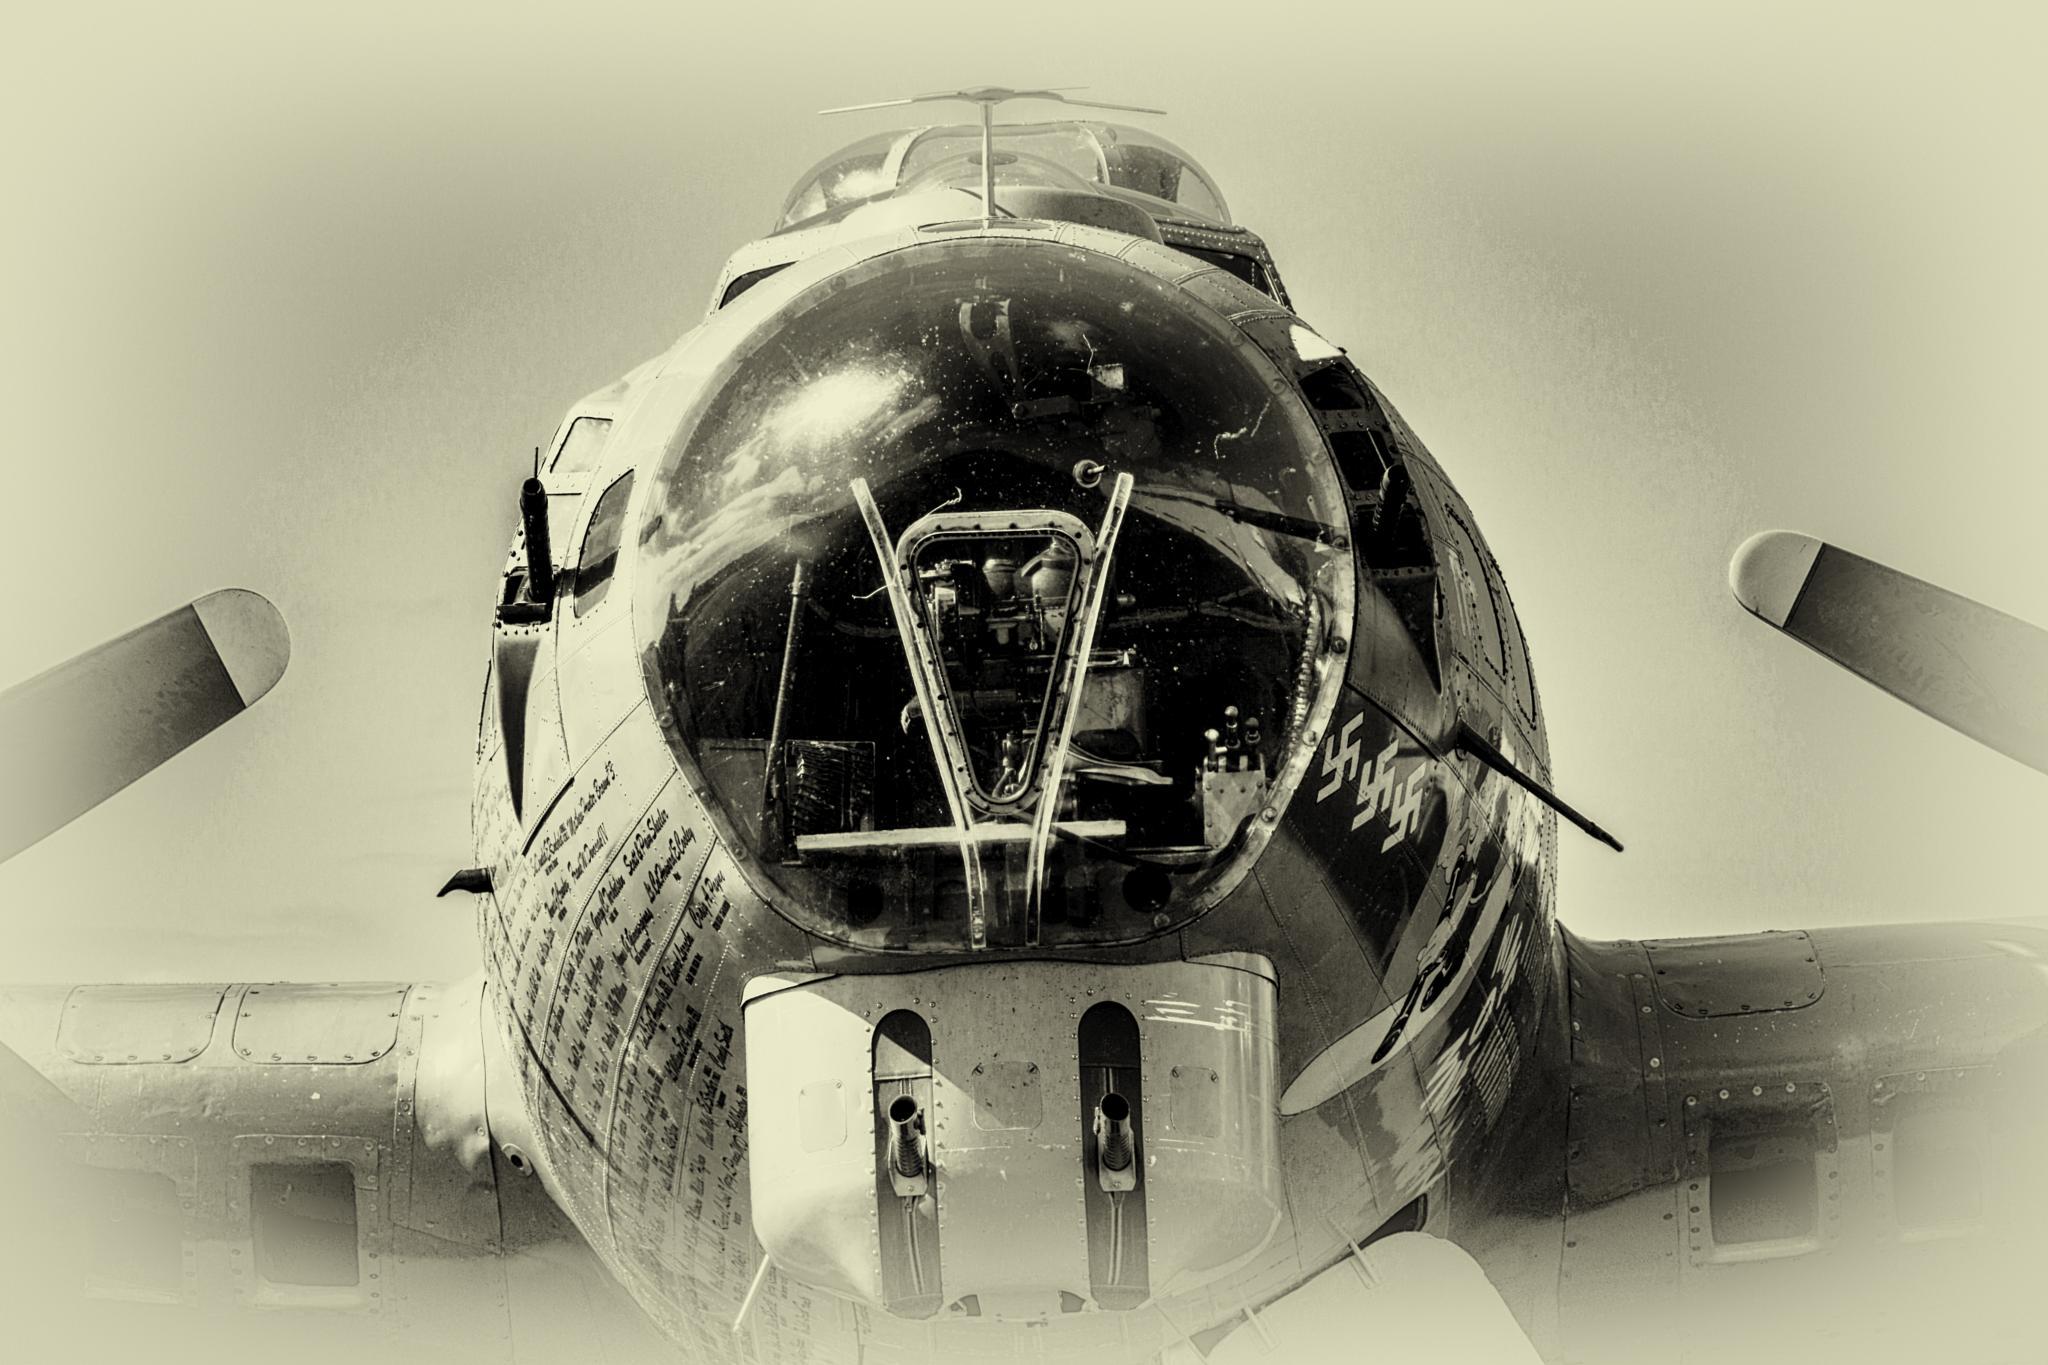 Bombardier's Seat V2 by JoeGeraci